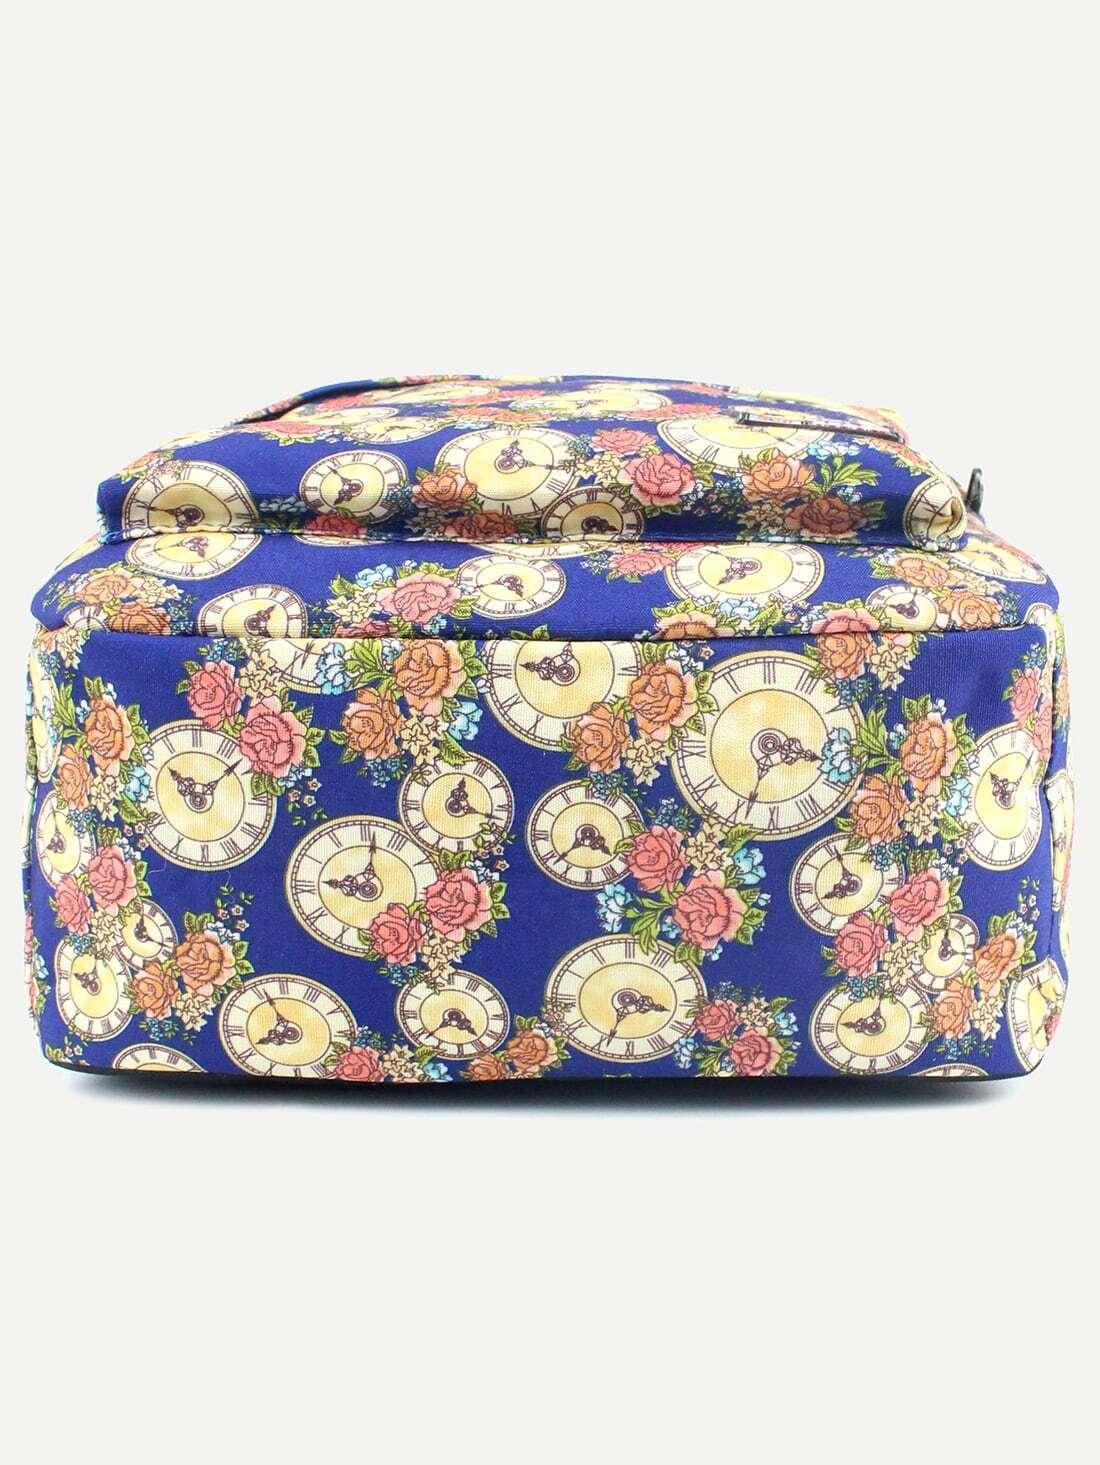 segeltuch rucksack mit rose druck blau german romwe. Black Bedroom Furniture Sets. Home Design Ideas